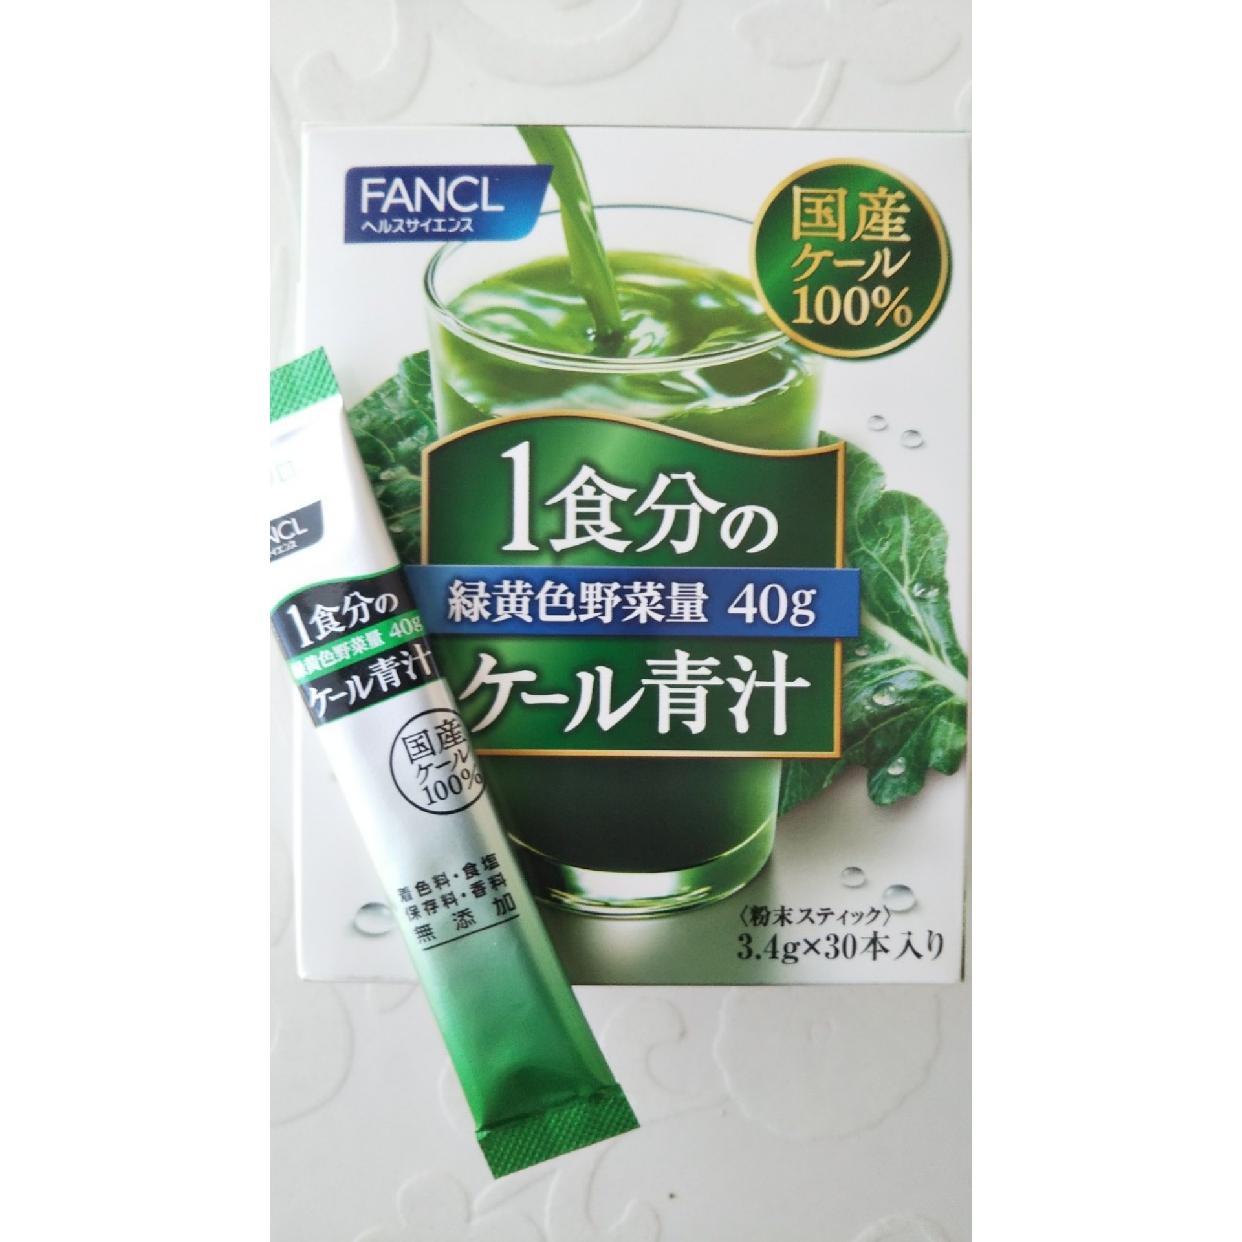 FANCL(ファンケル)1日分のケール青汁を使ったmoriyaさんのクチコミ画像1